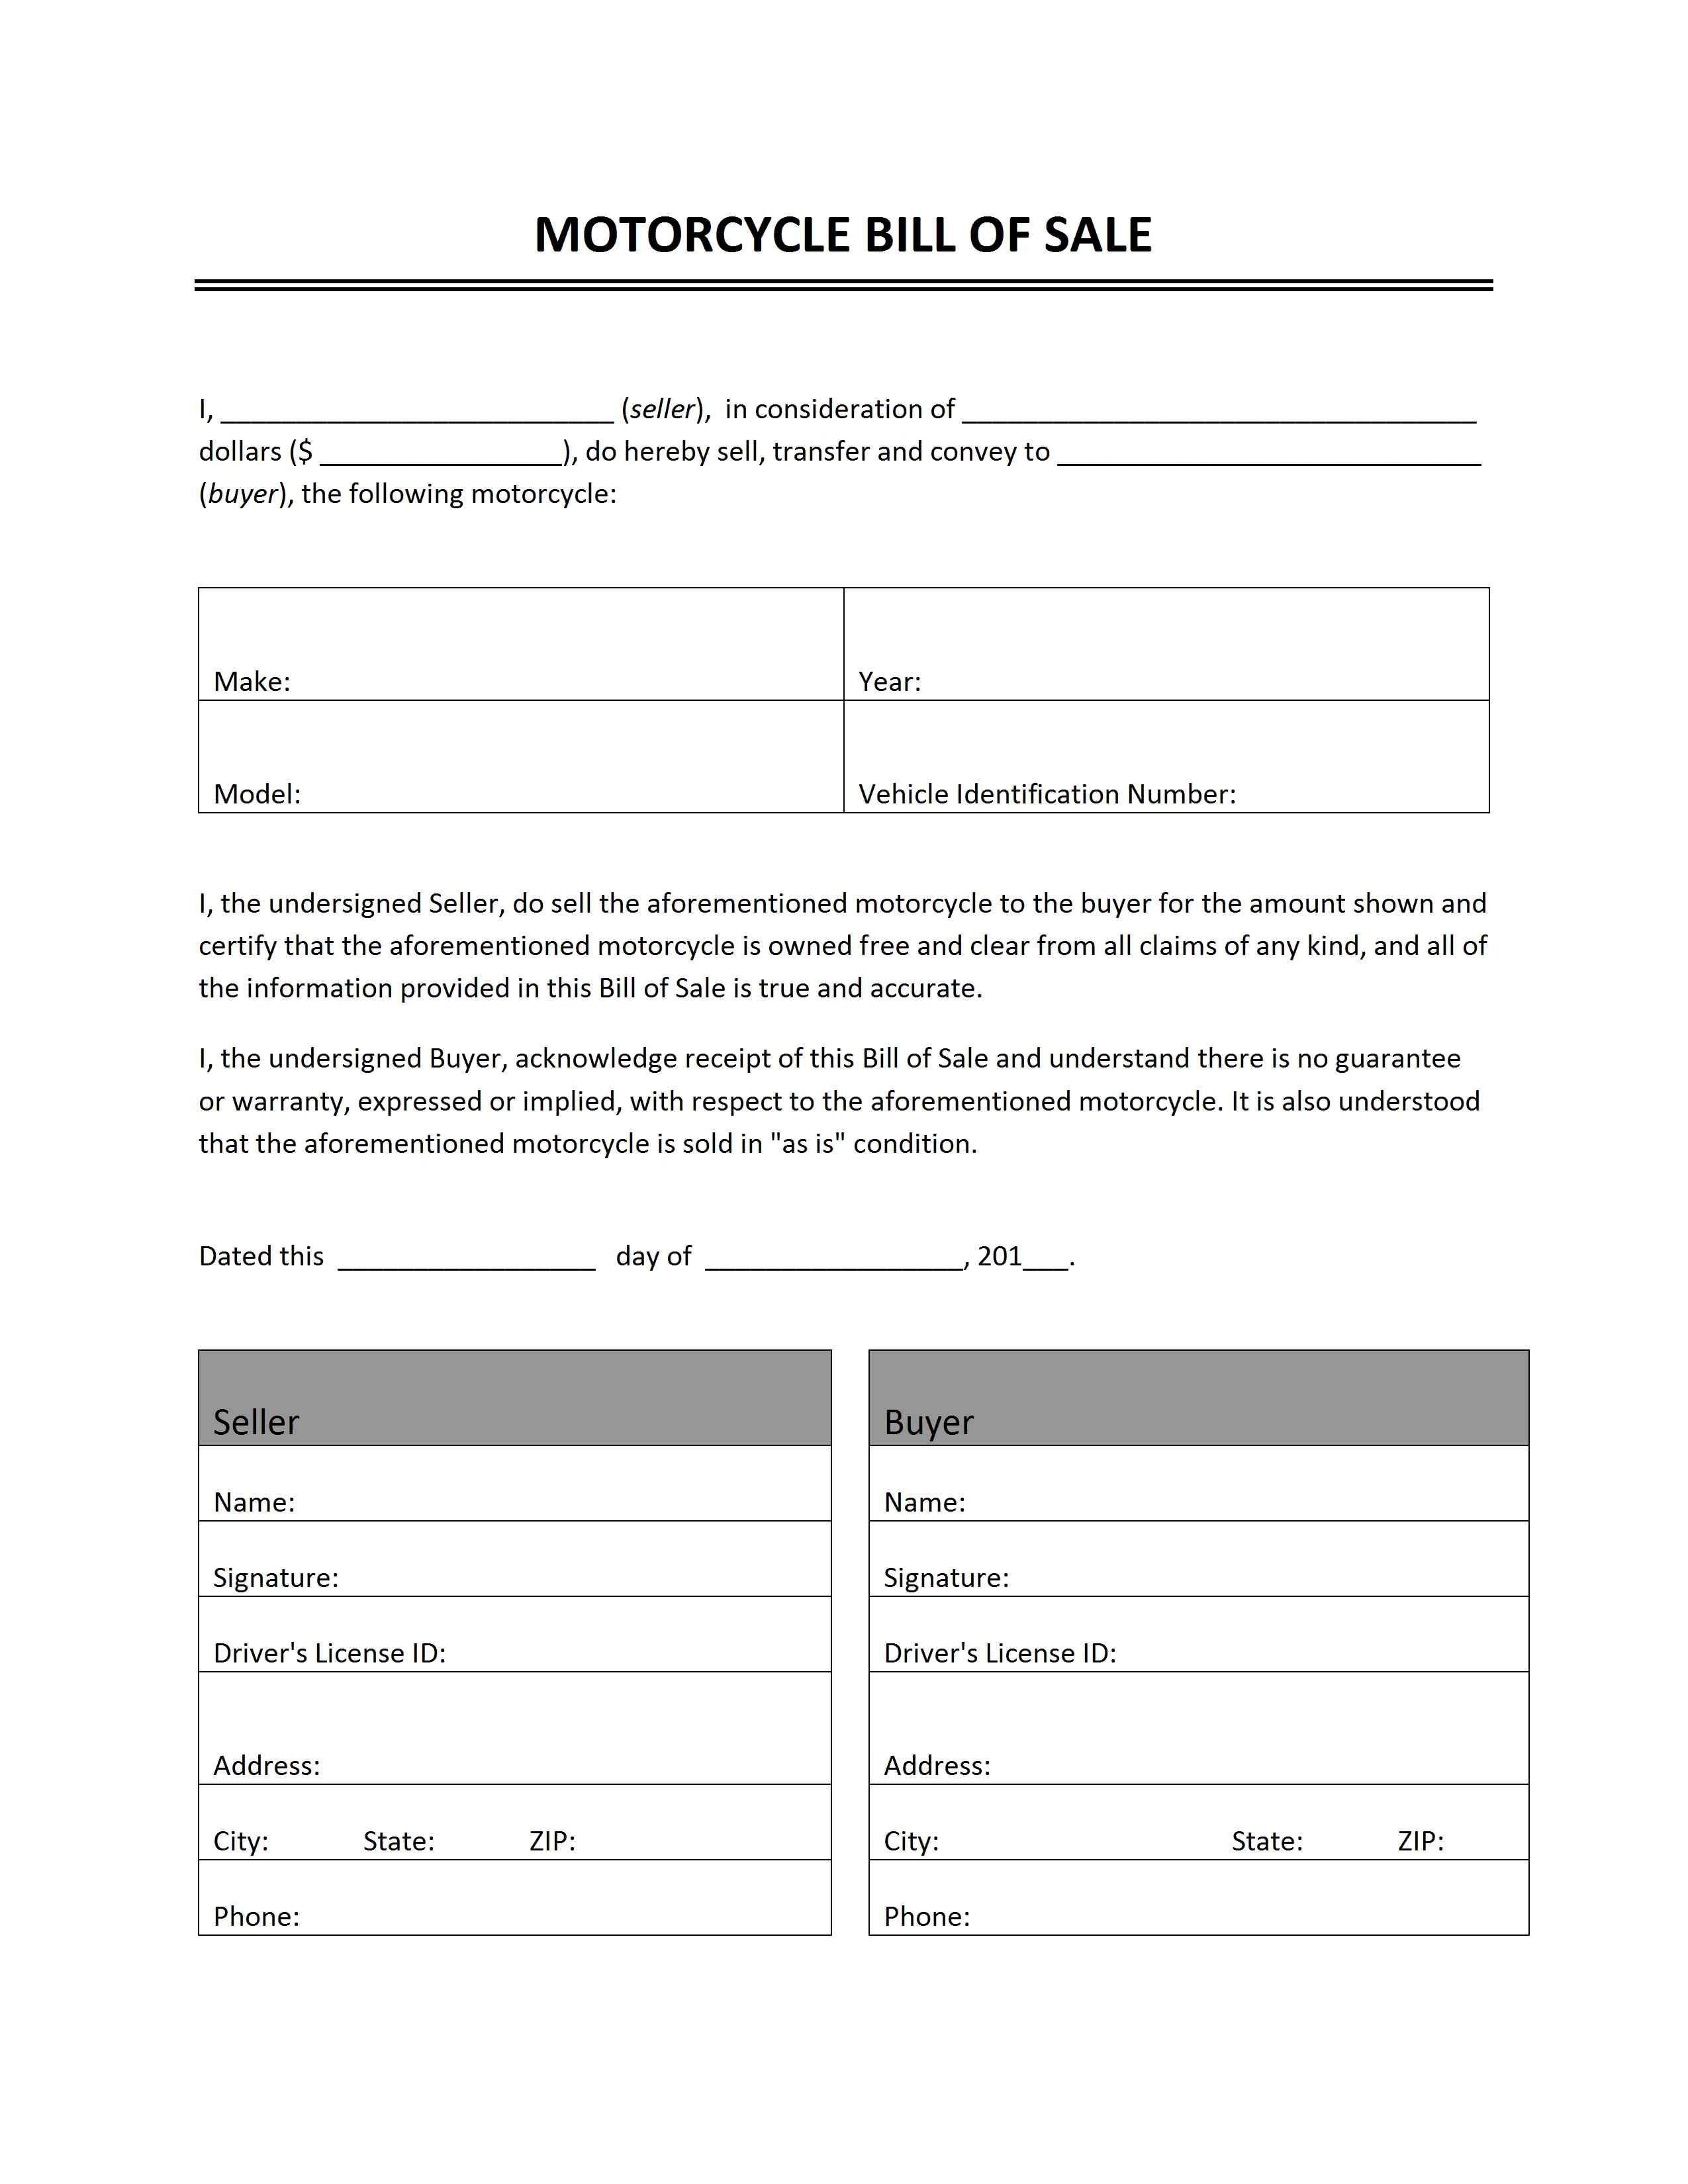 Printable Sample Bill Of Sale Templates Form Bill Of Sale Template Receipt Template Invoice Template Motorcycle bill of sale printable